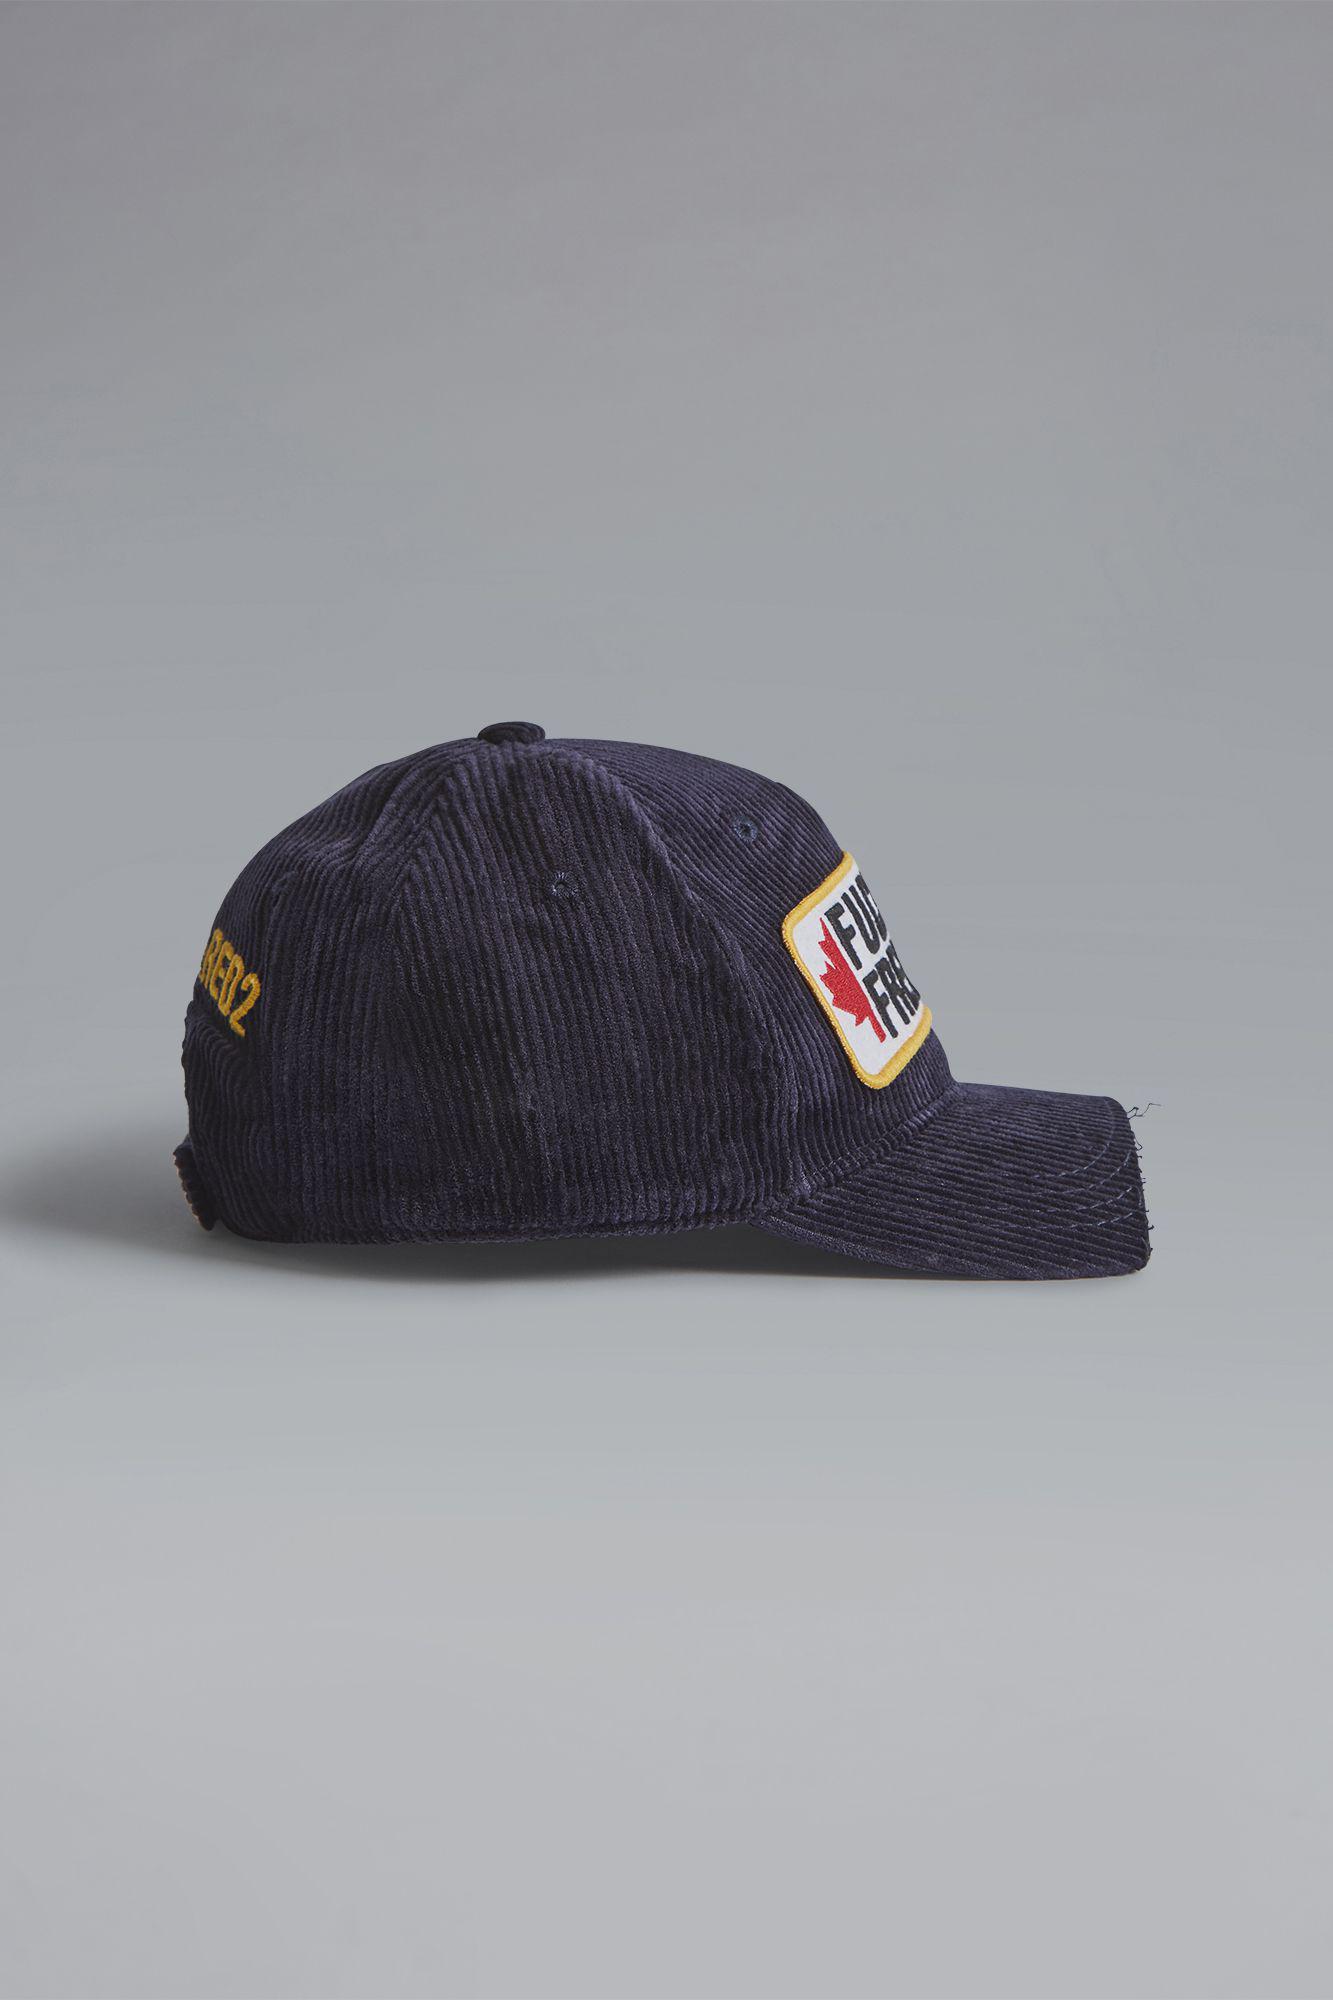 fd31c3ca445d7d Lyst - DSquared² F***in' Freezing Baseball Cap in Blue for Men